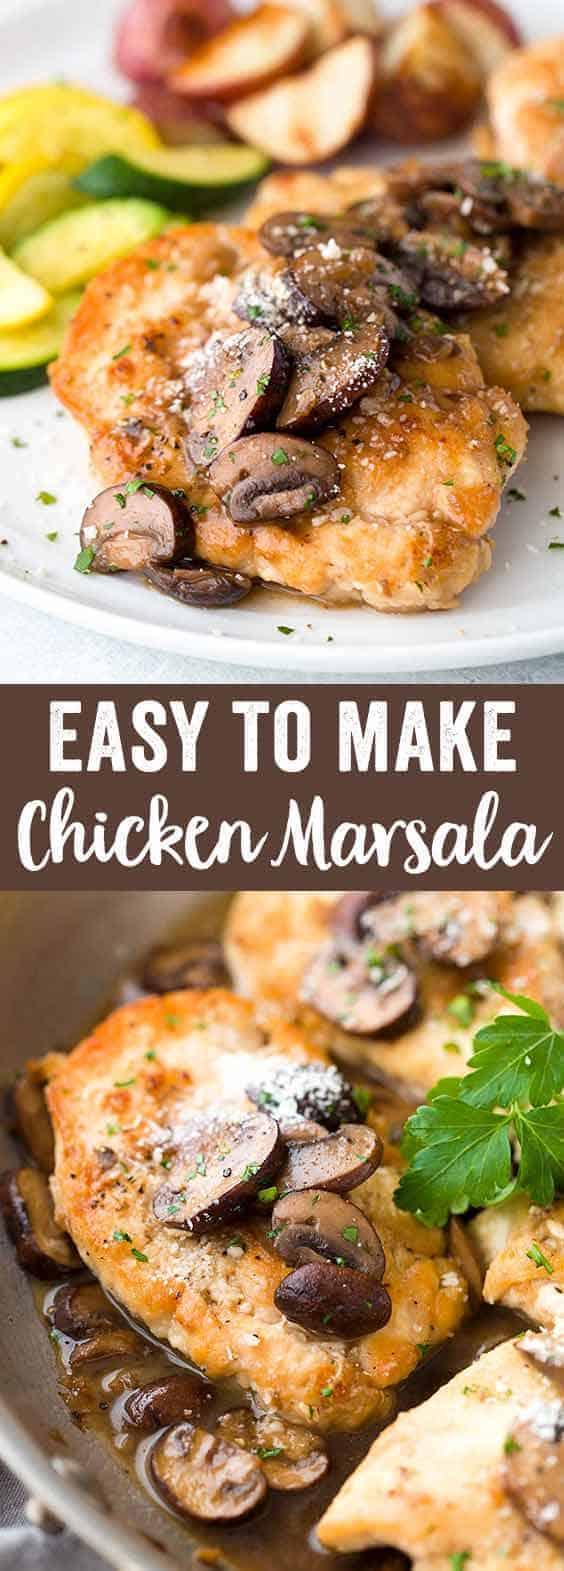 Easy chicken marsala recipe with mushrooms jessica gavin - Olive garden chicken marsala calories ...